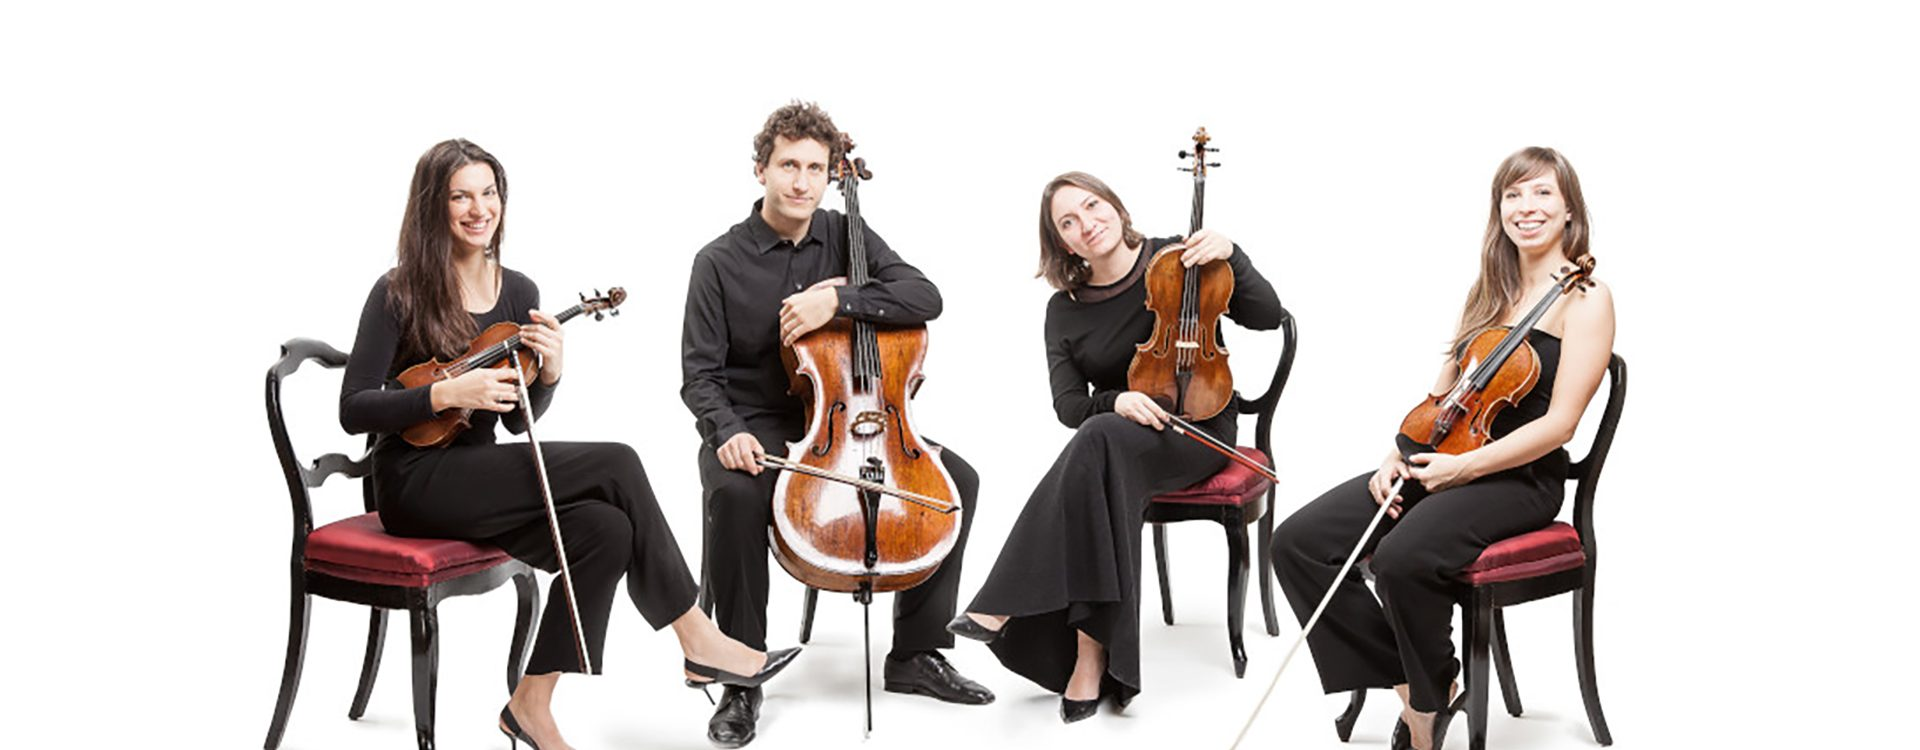 quartetto-lyskamm-rid